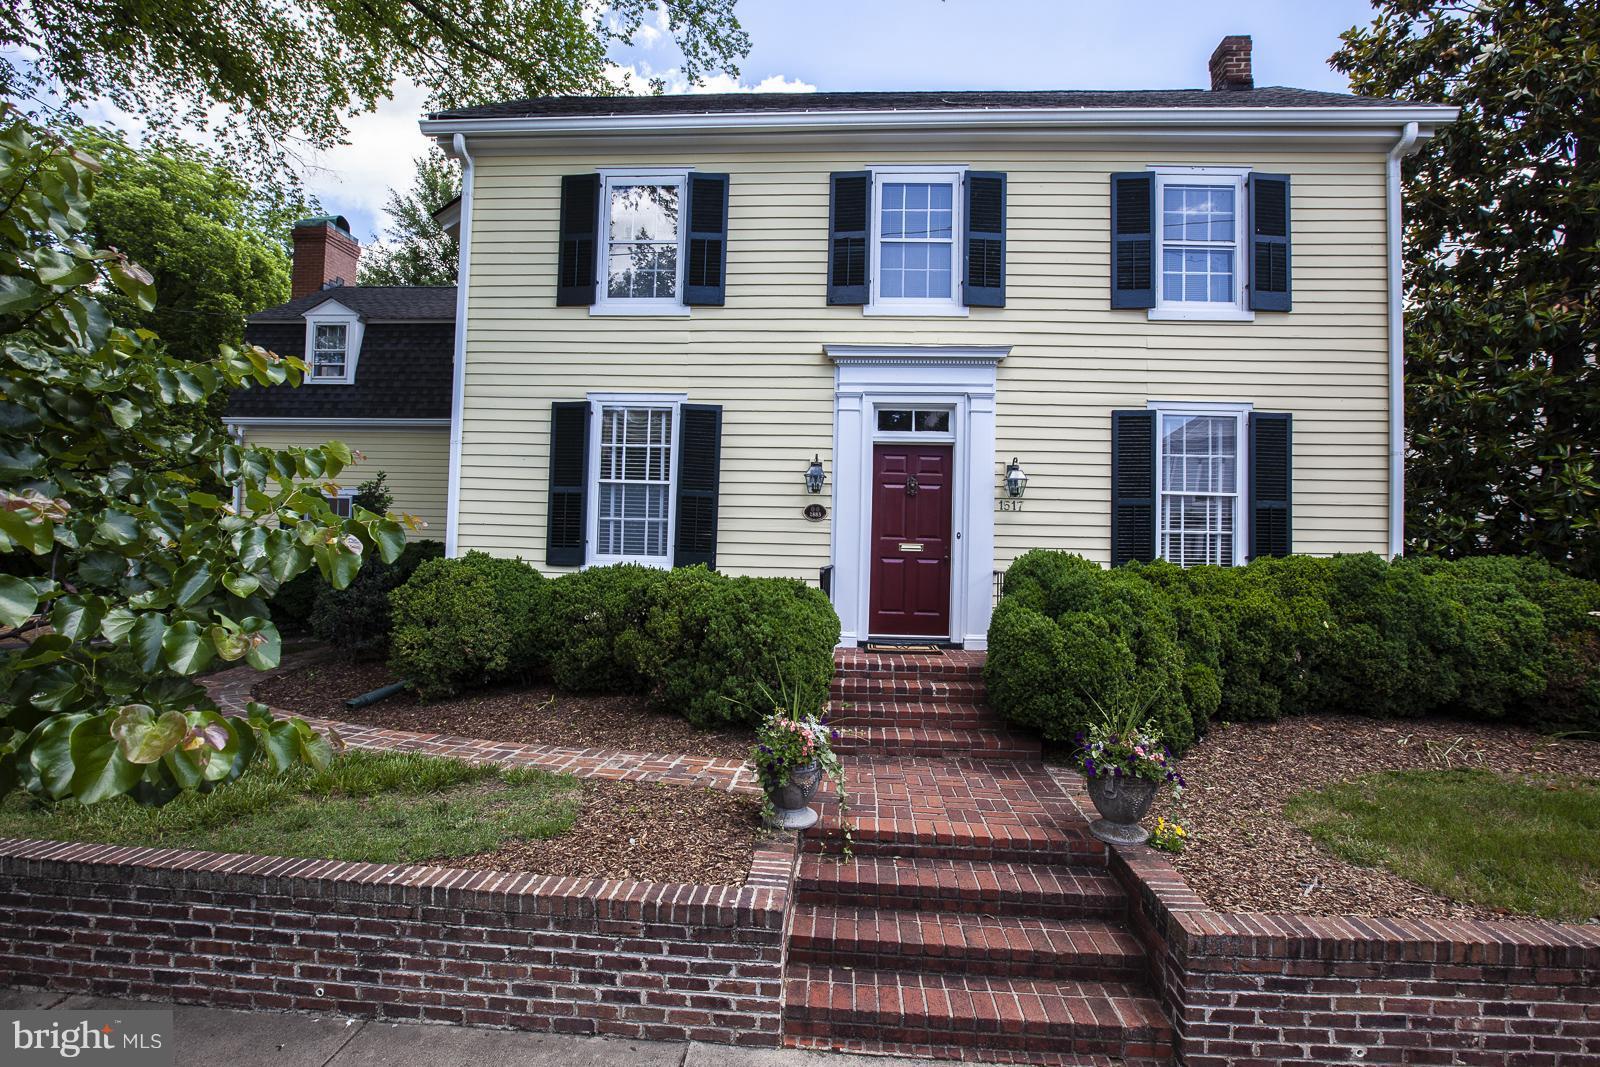 1517 CAROLINE STREET, FREDERICKSBURG, VA 22401